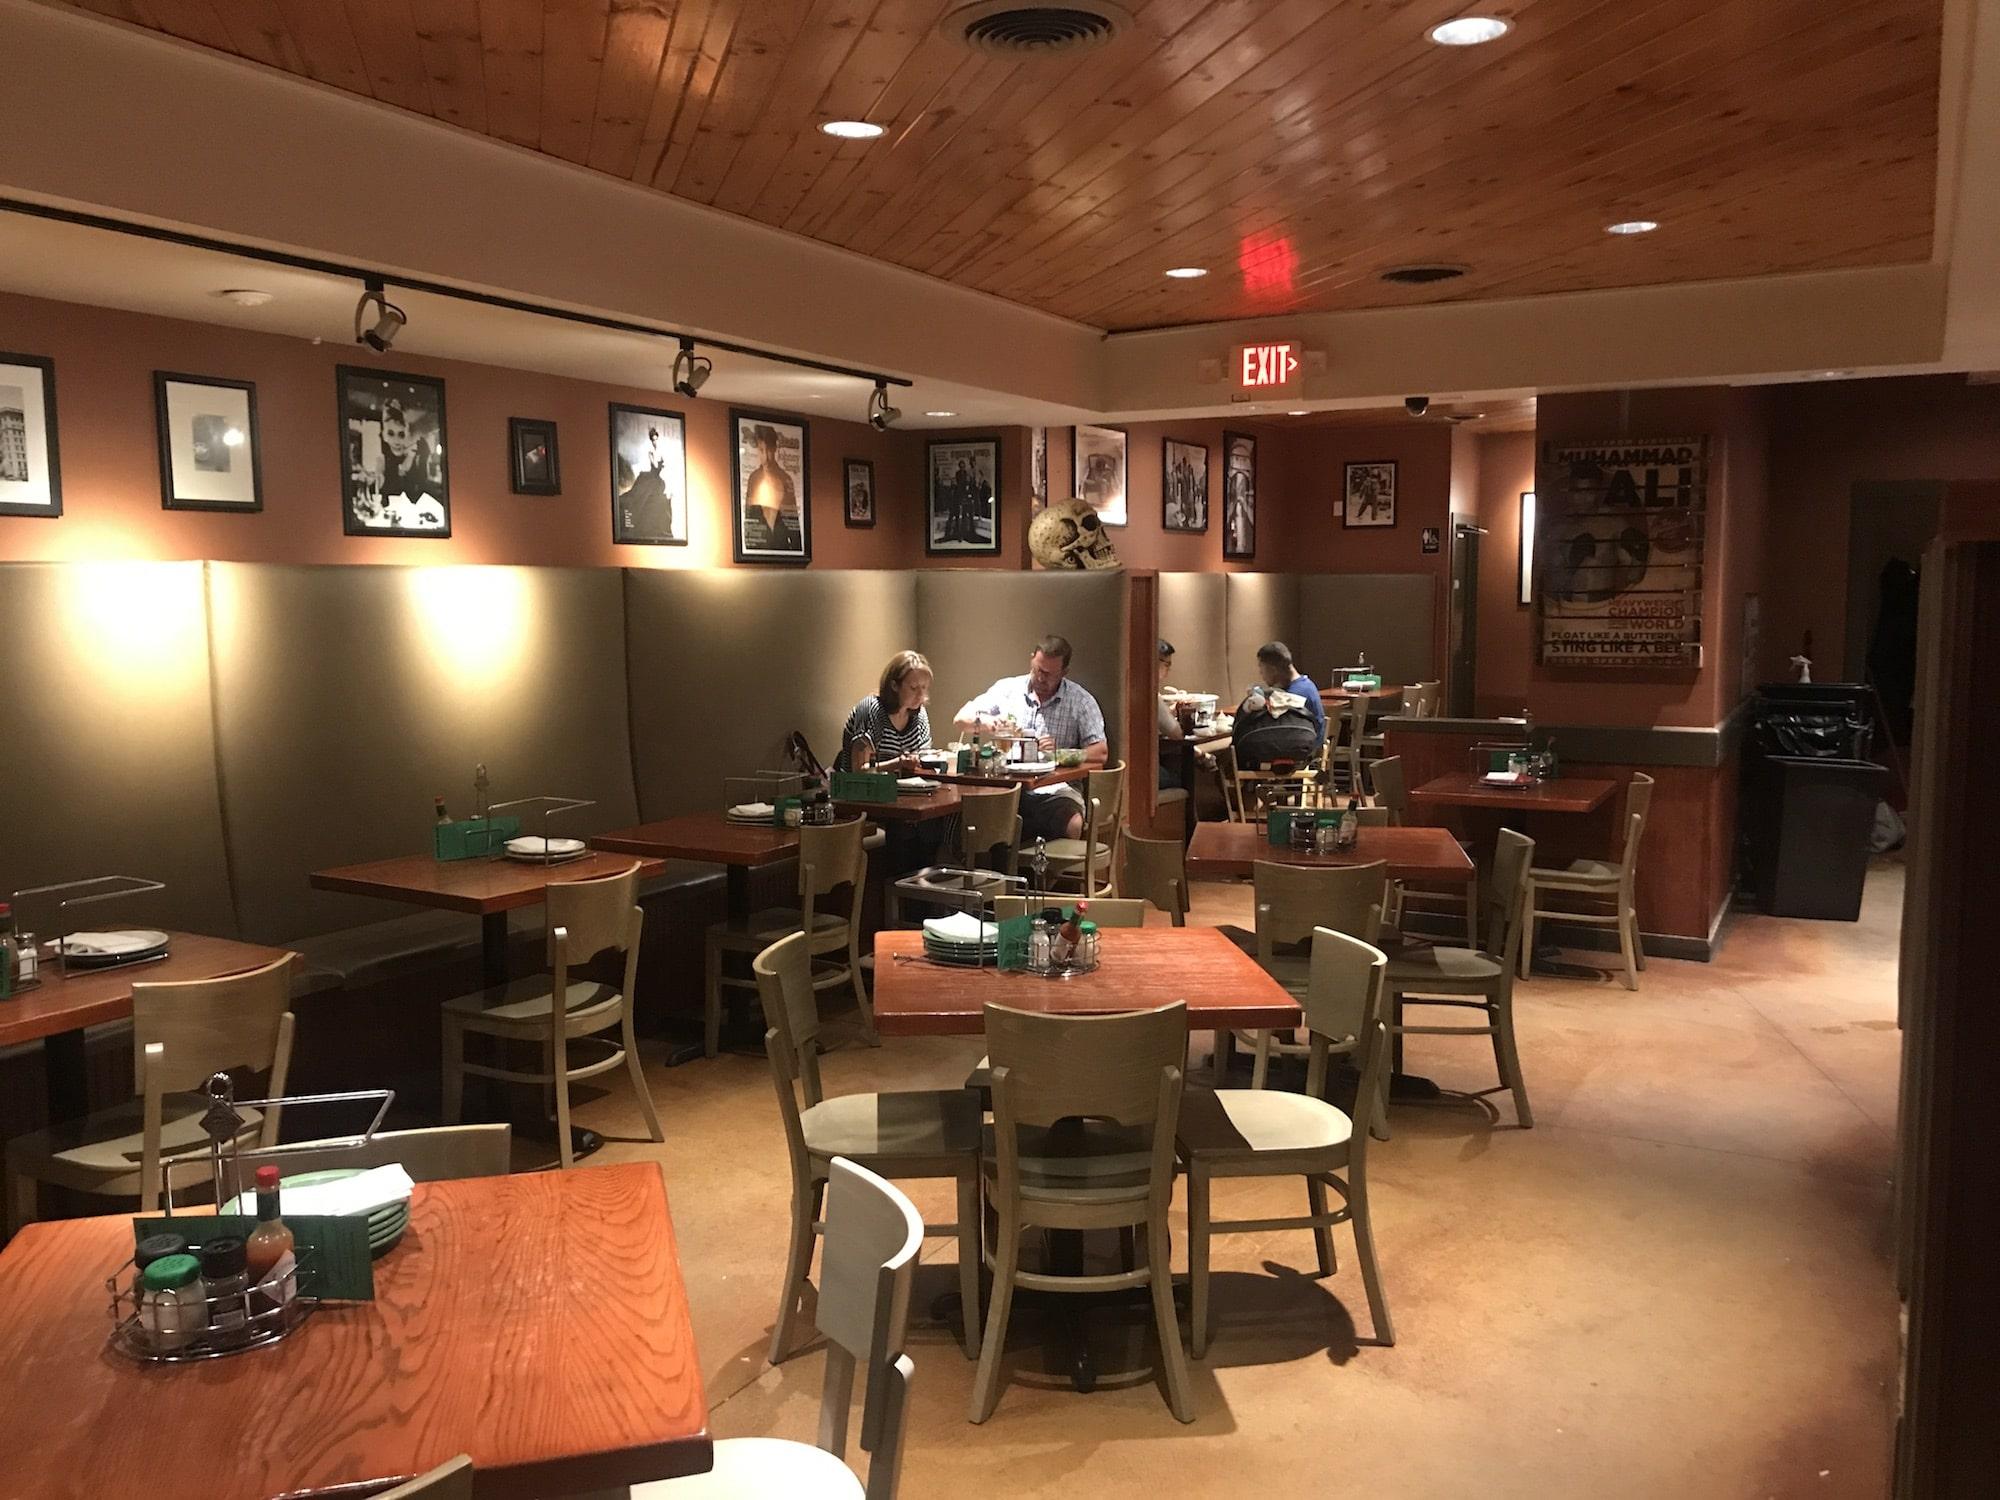 kaiser's pizza, kenosha pizza shop, bar & grill in kenosha